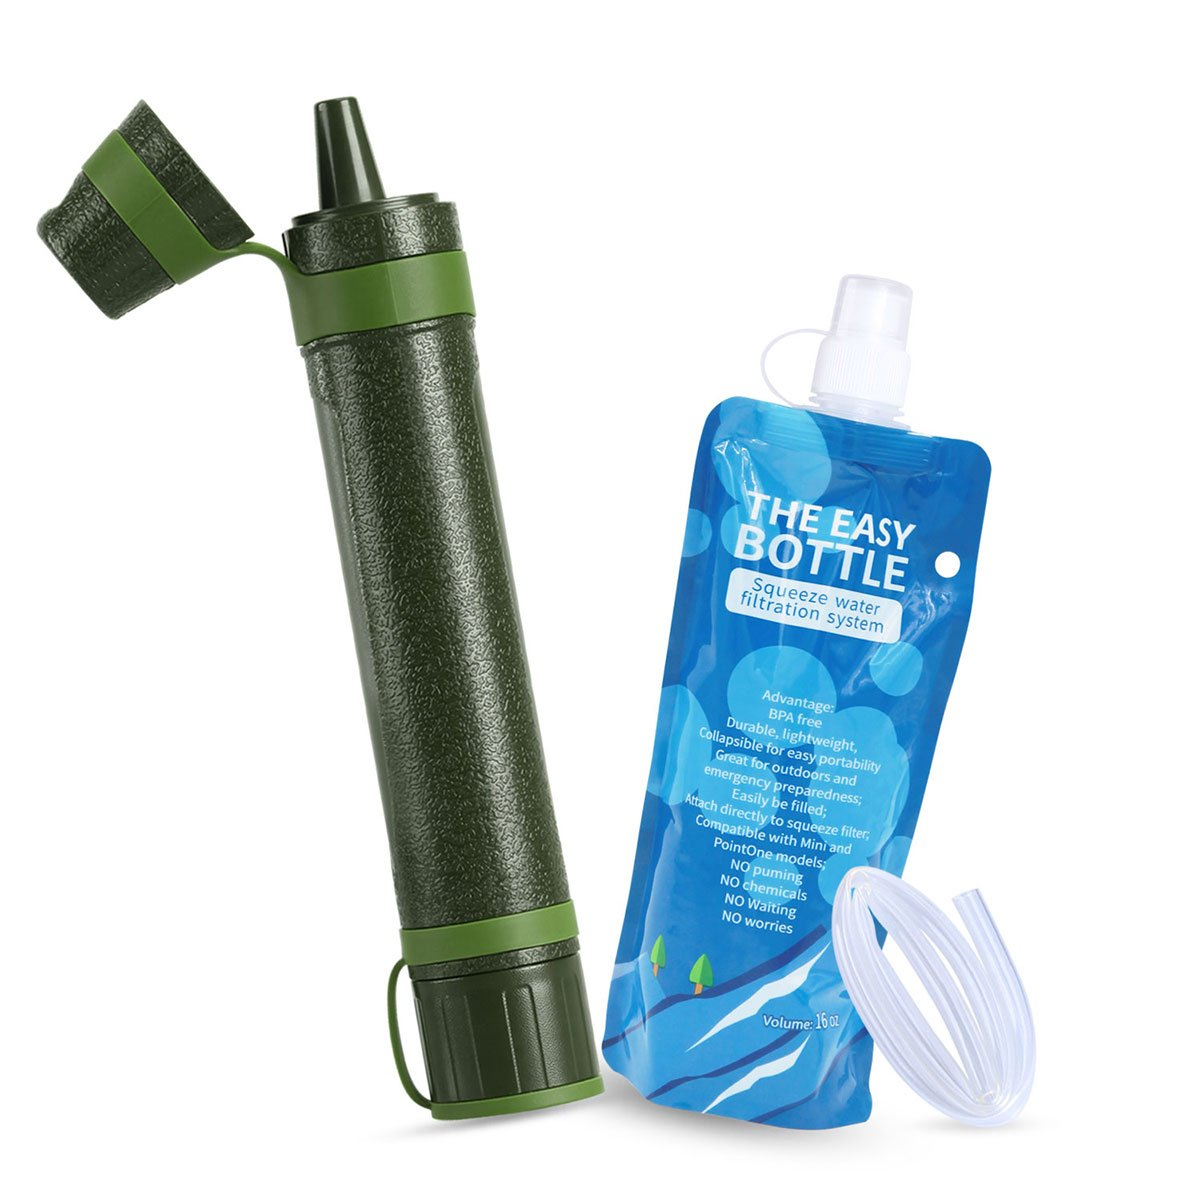 Axmda Mini Filtro de Agua Portátil Paja de Filtro para Camping Senderismo